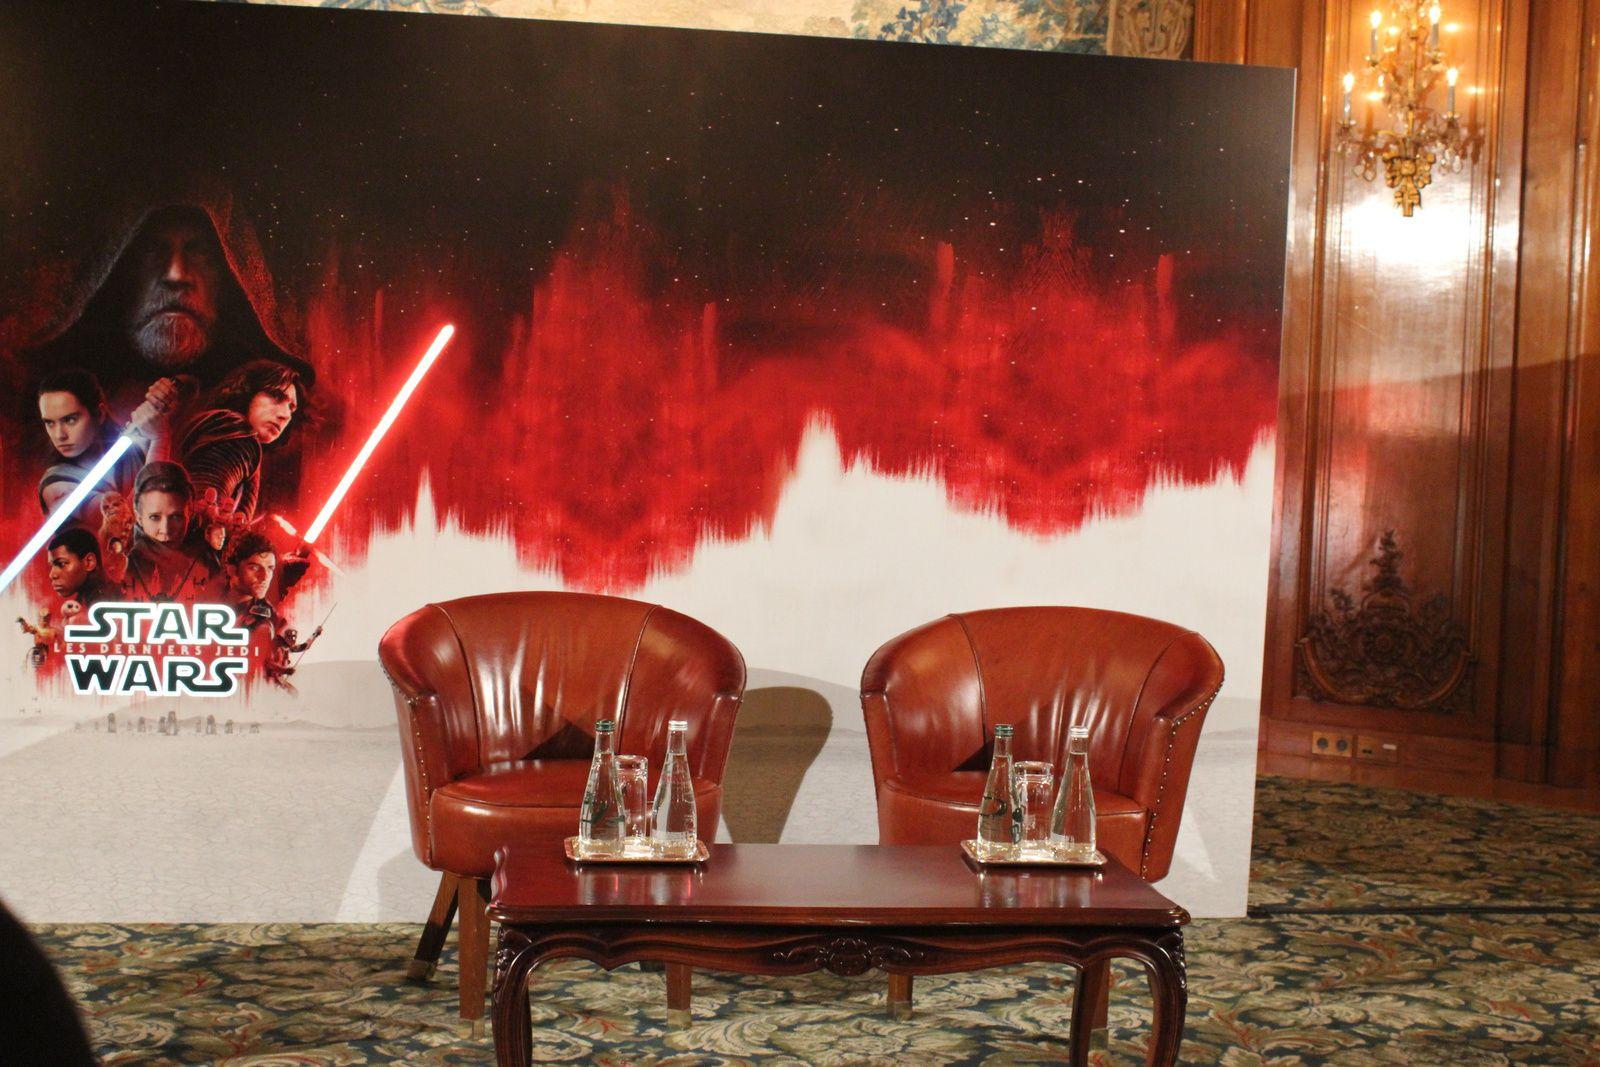 Star Wars : rencontre avec Rian Johnson & Ram Bergman